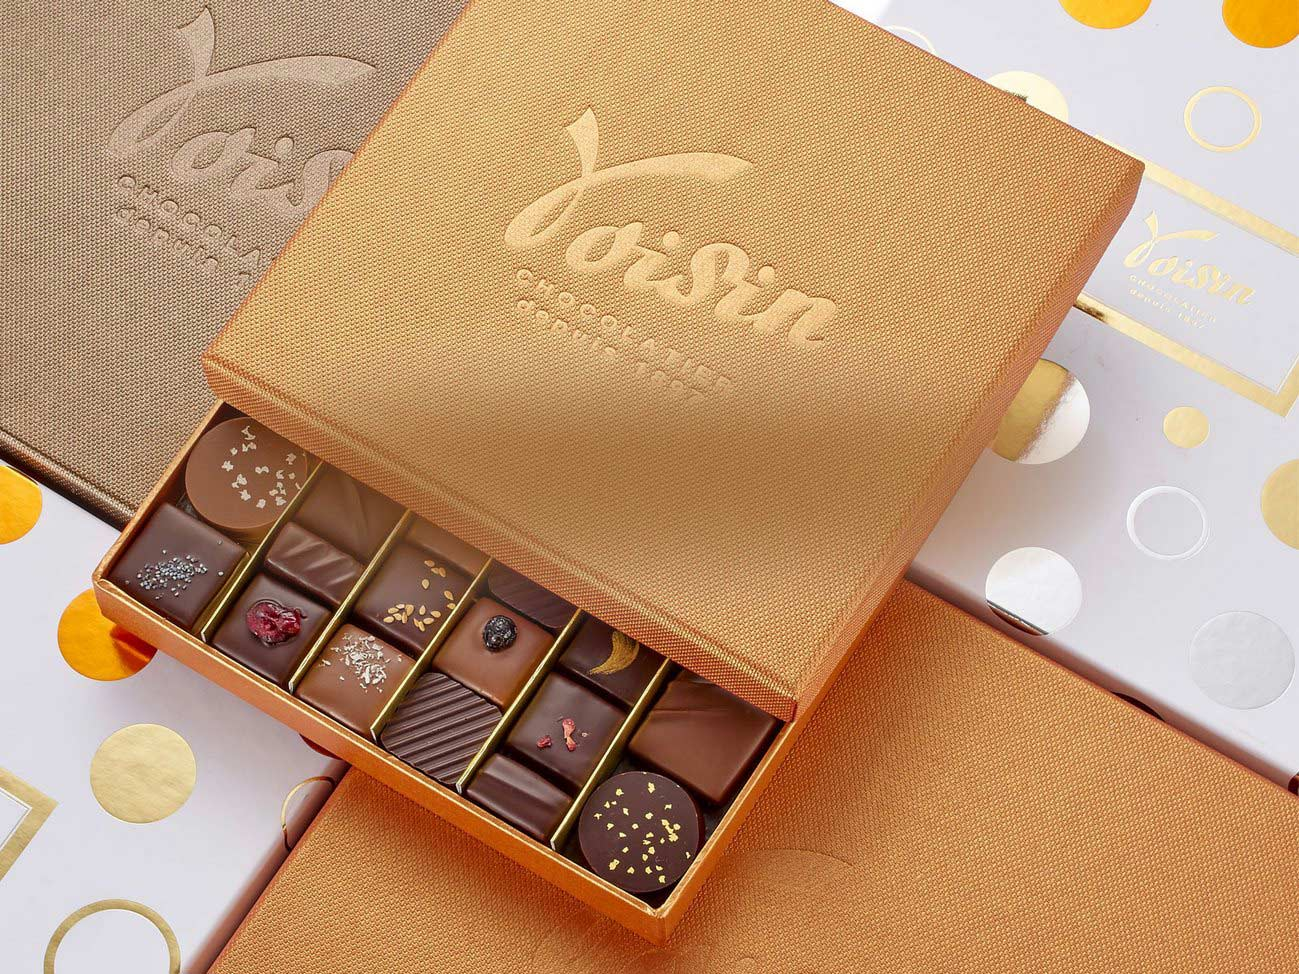 Coffrets de chocolats Voisin